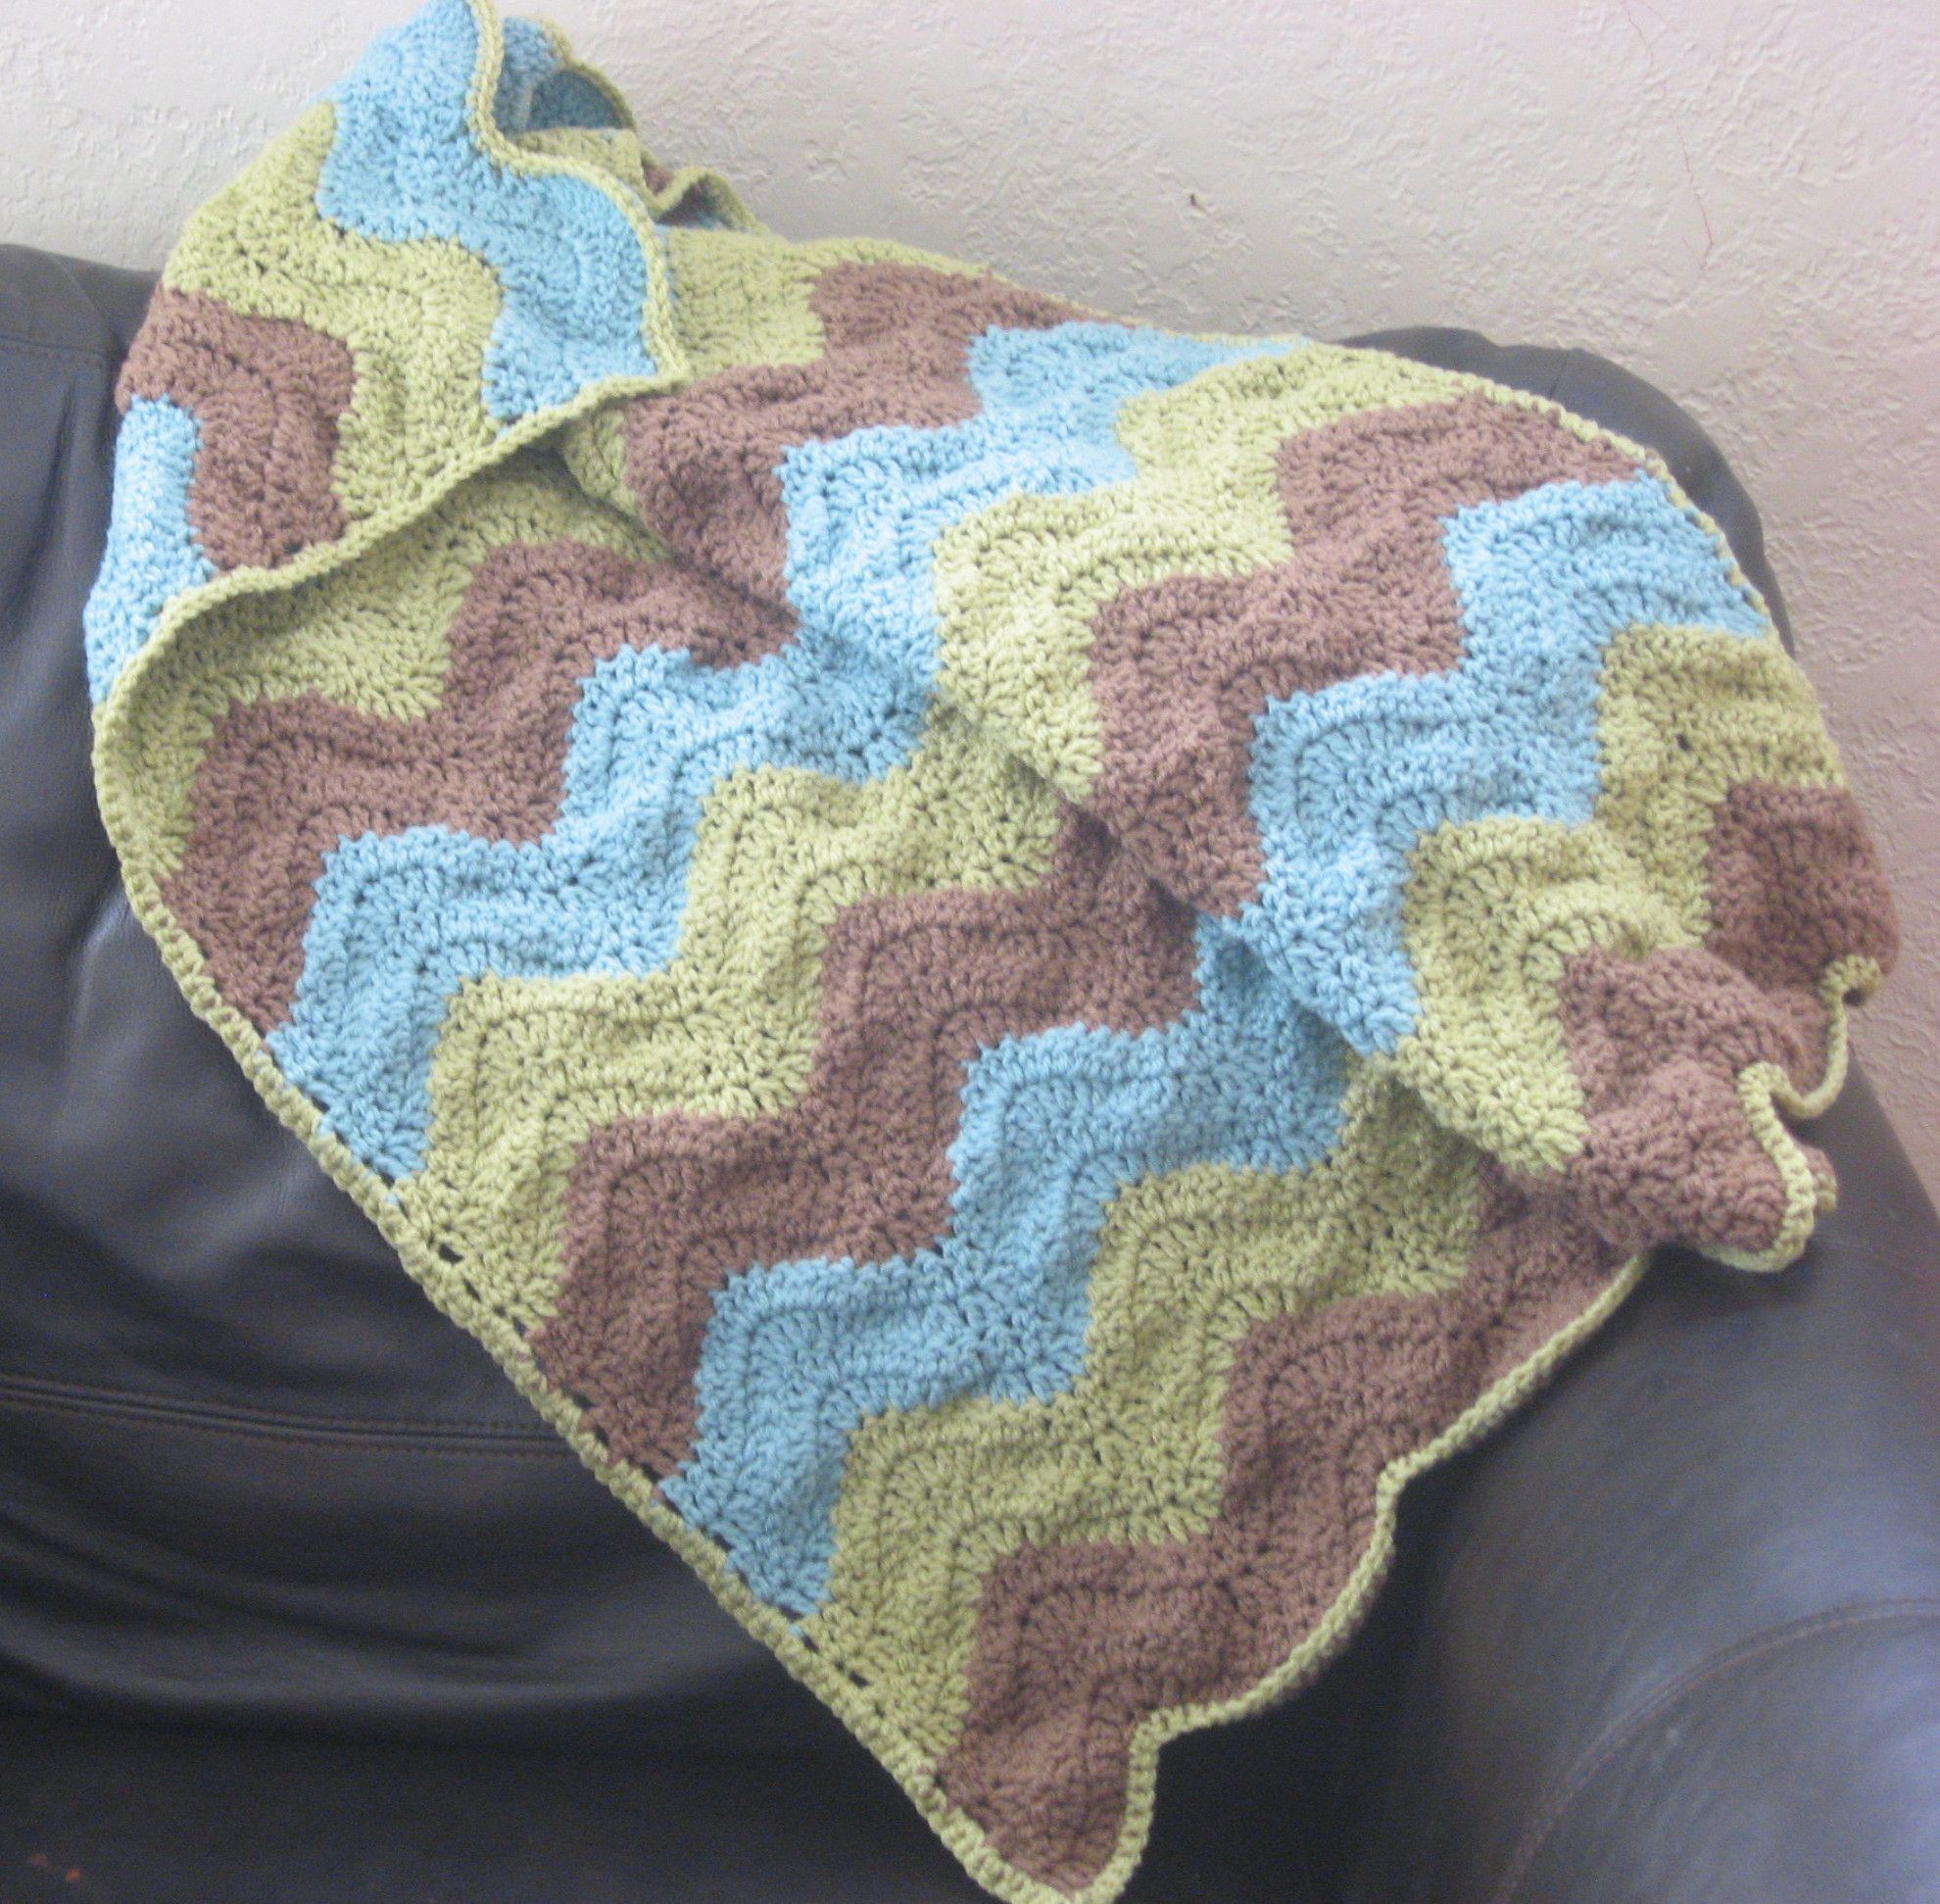 Crochet Blocking (Ripple Baby Afghan)